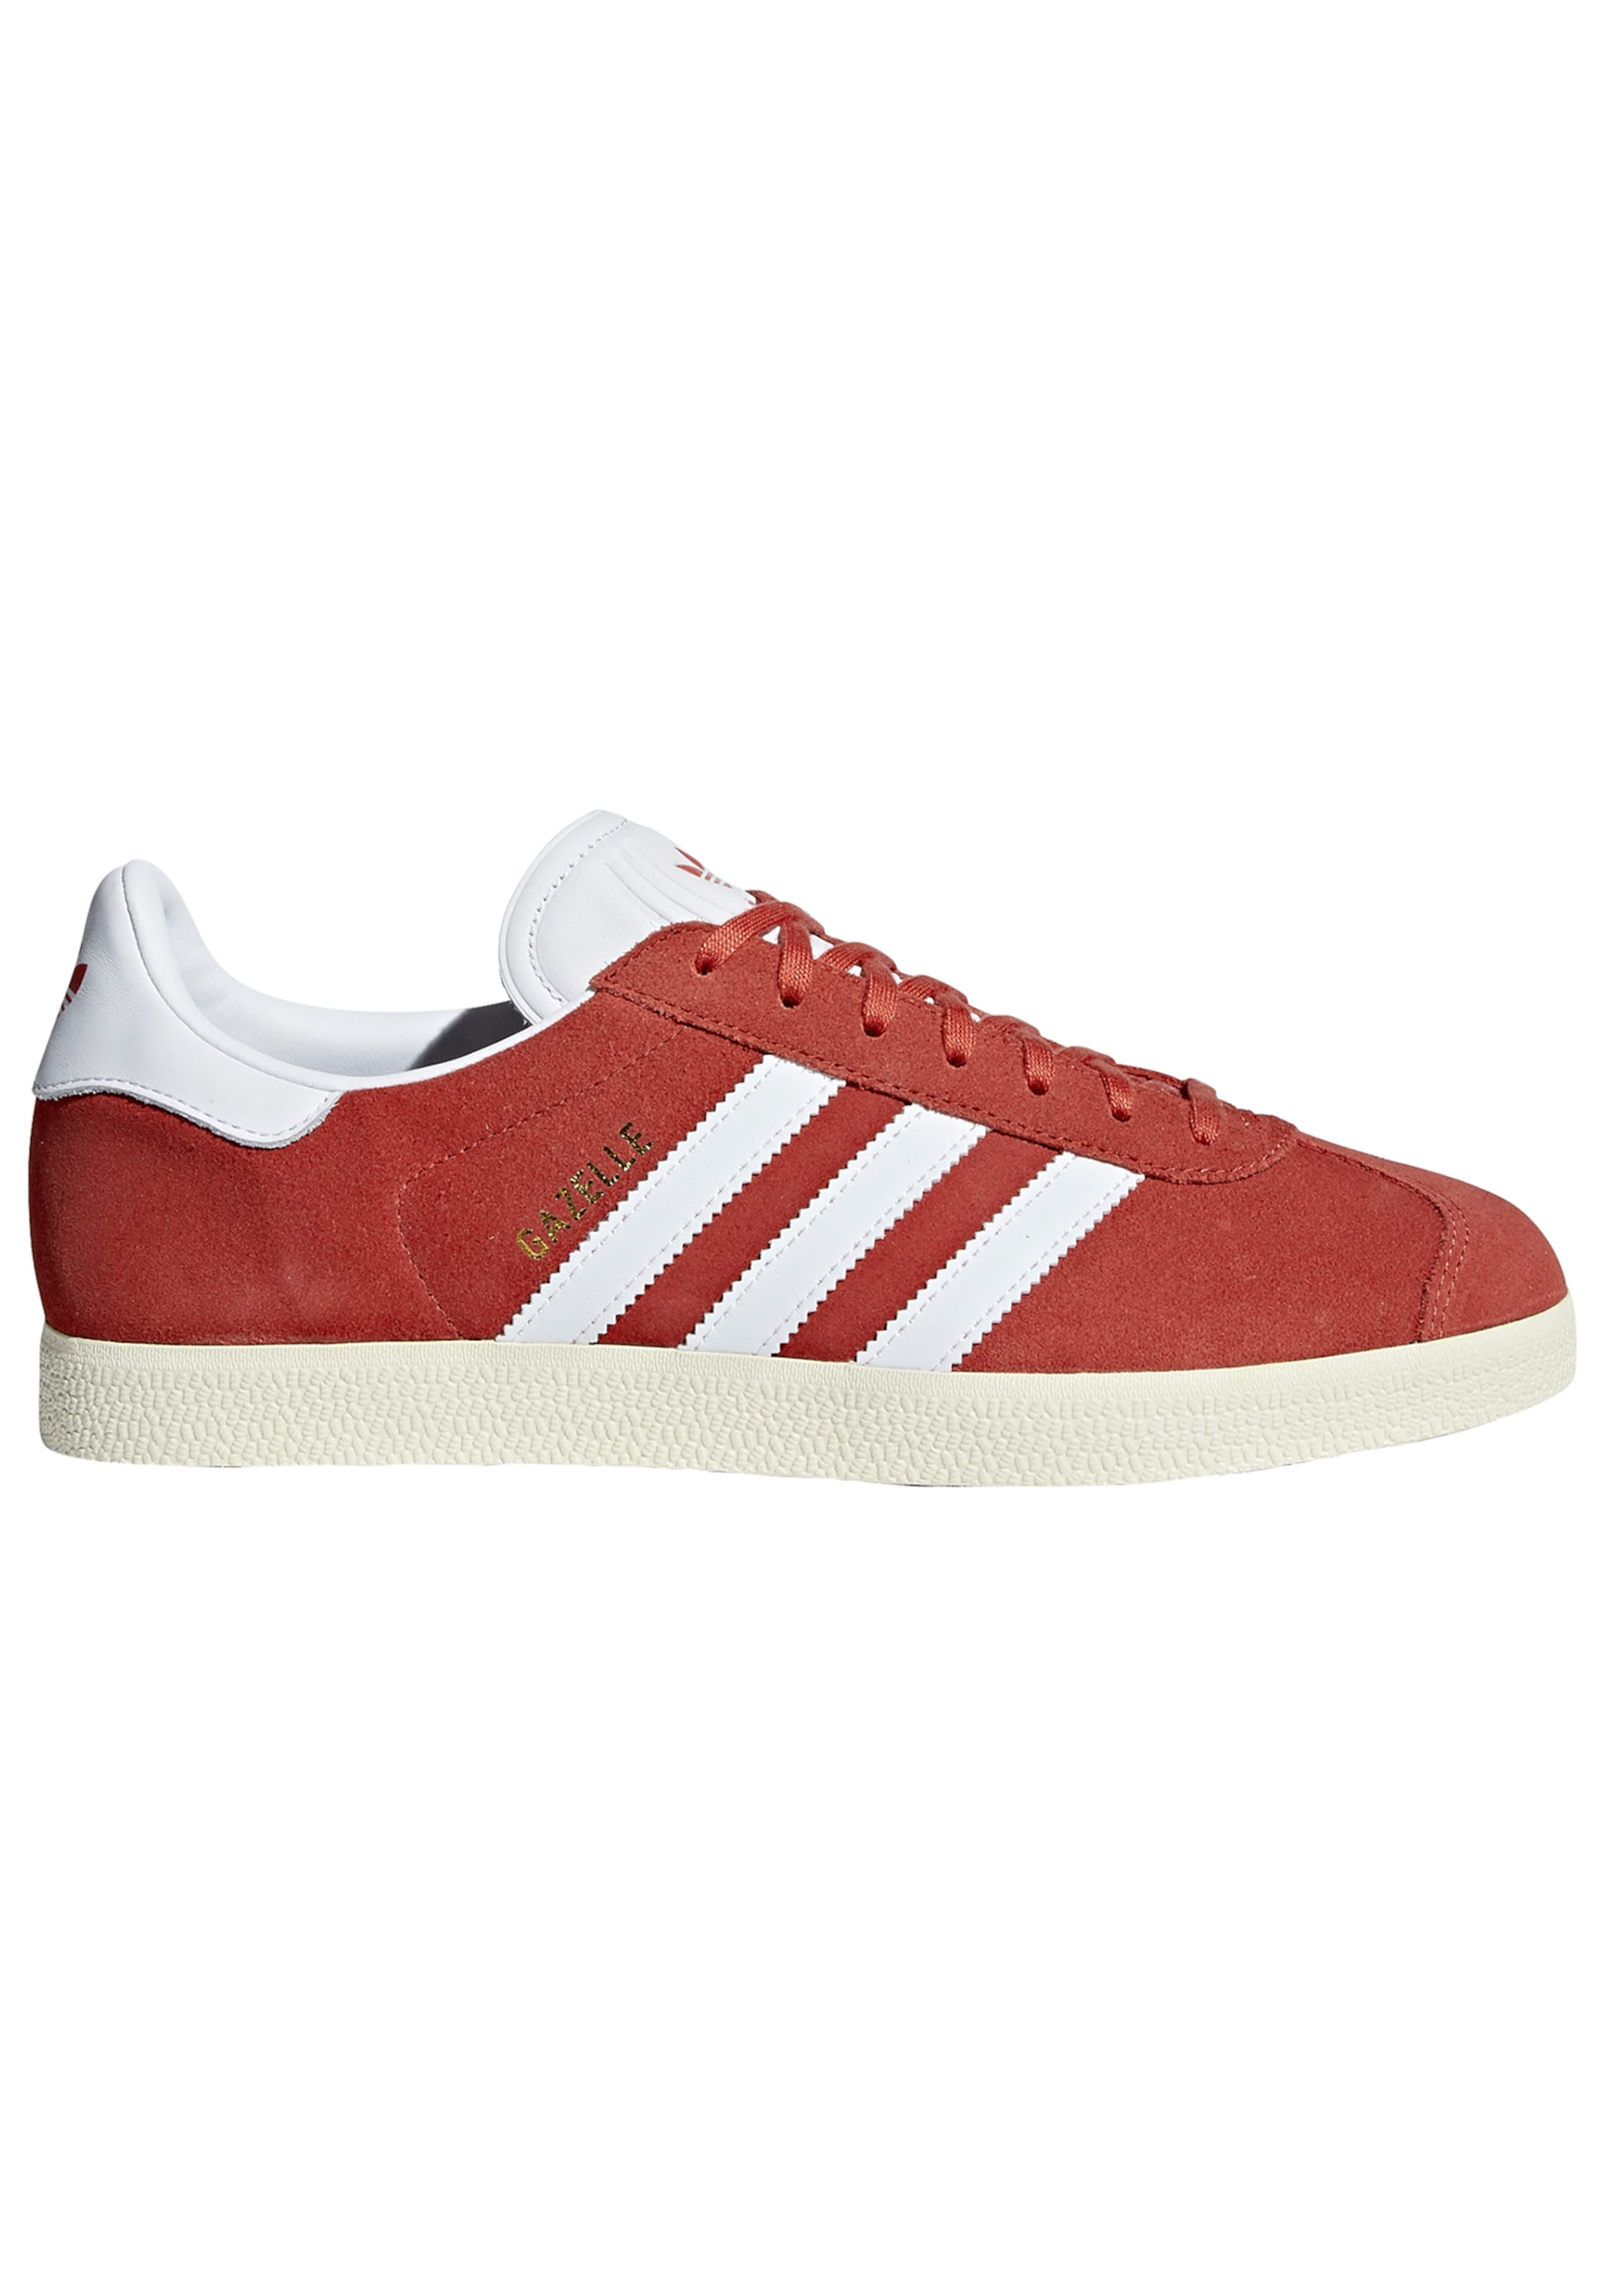 In Originals Rot Sneaker 'gazelle' Adidas 3Aj4cSR5Lq